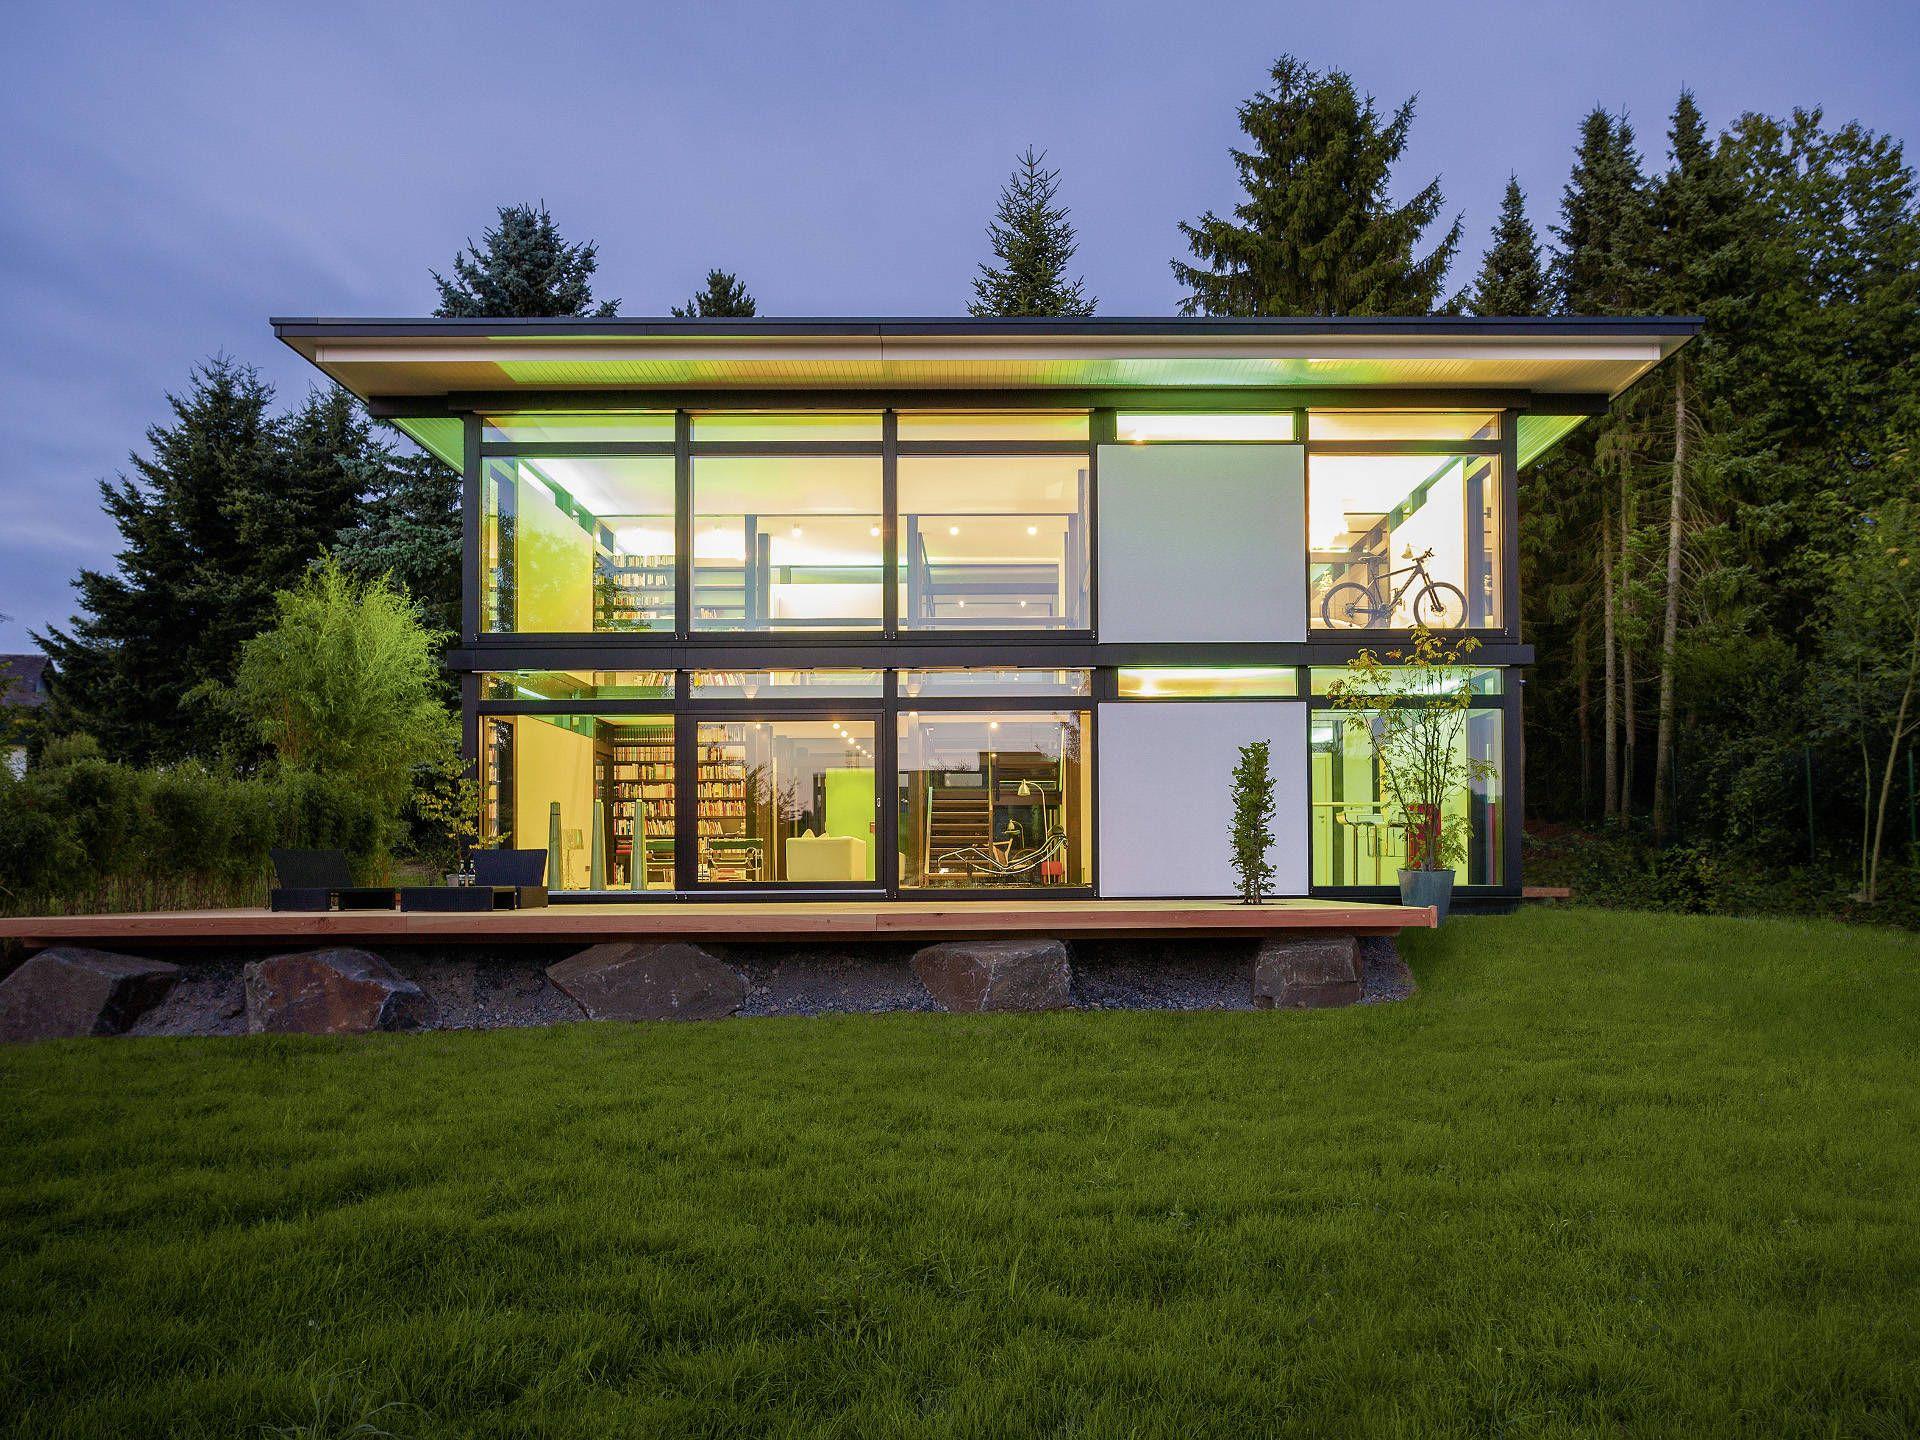 Huf haus modum 7 10 mit flachdach fachwerkhaus von huf for Musterhaus flachdach